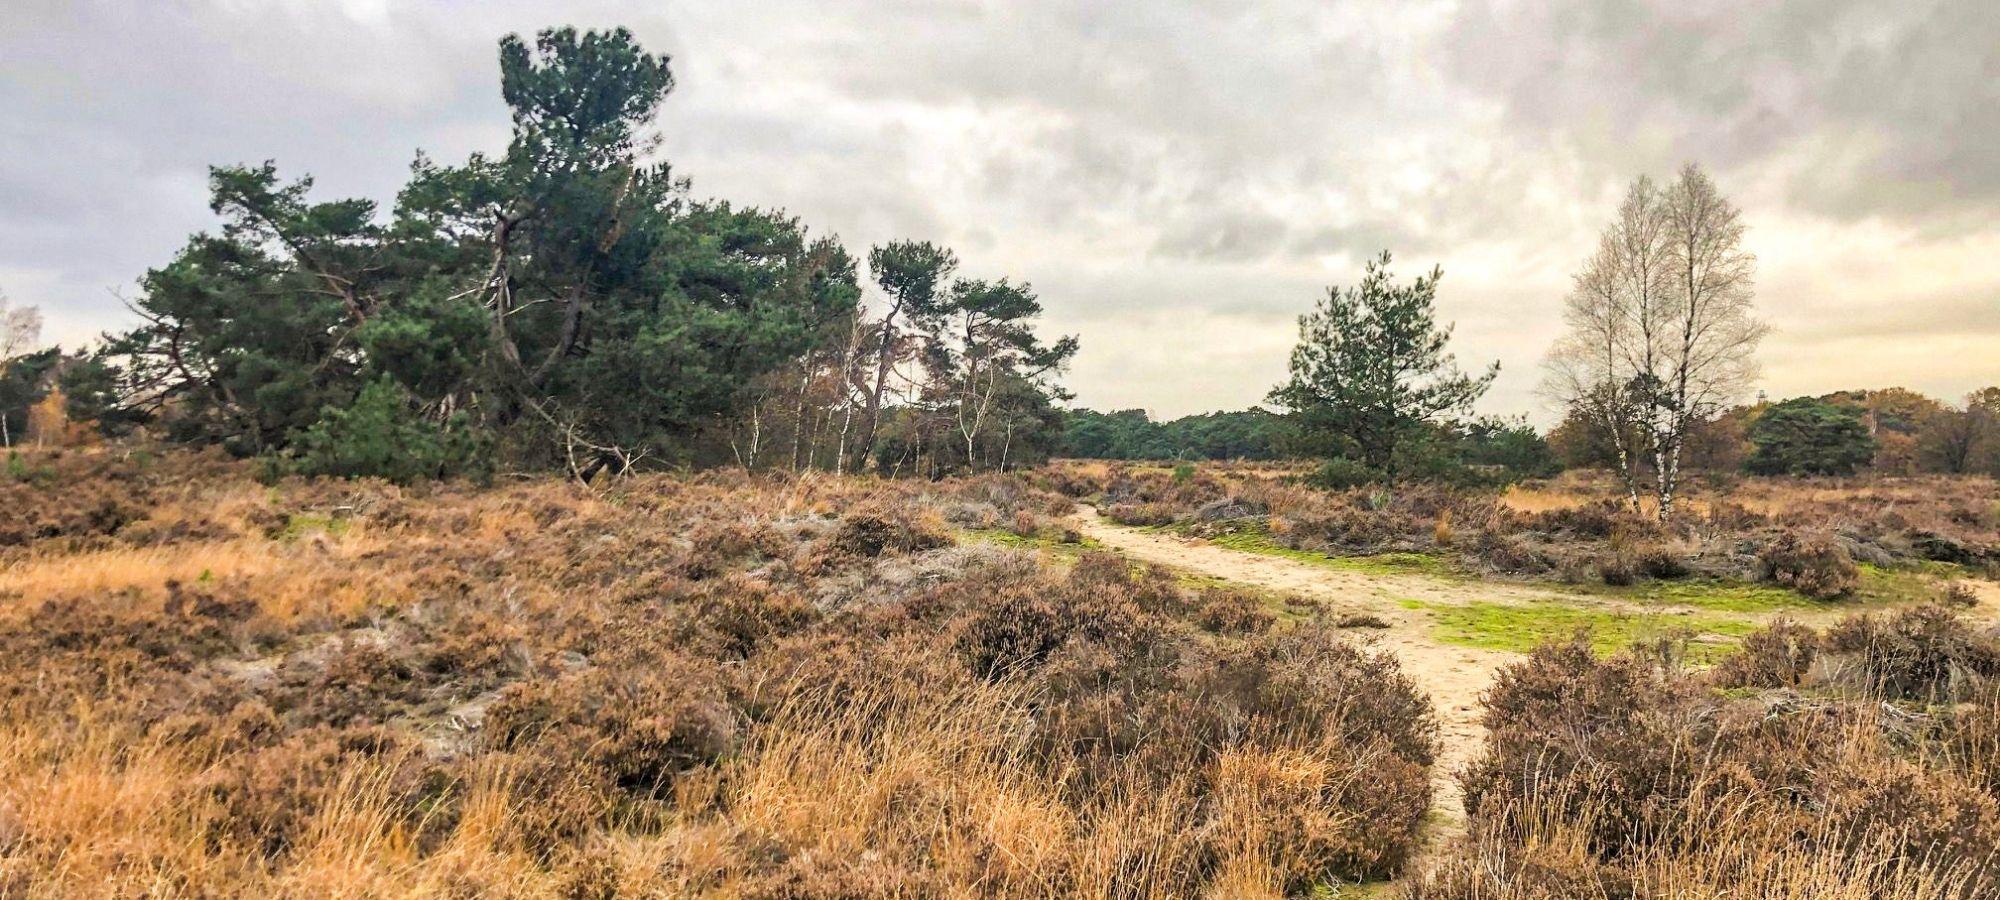 The heath and shrubs in fall hues at Kalmthoutse Heide in Antwerp, Belgium.